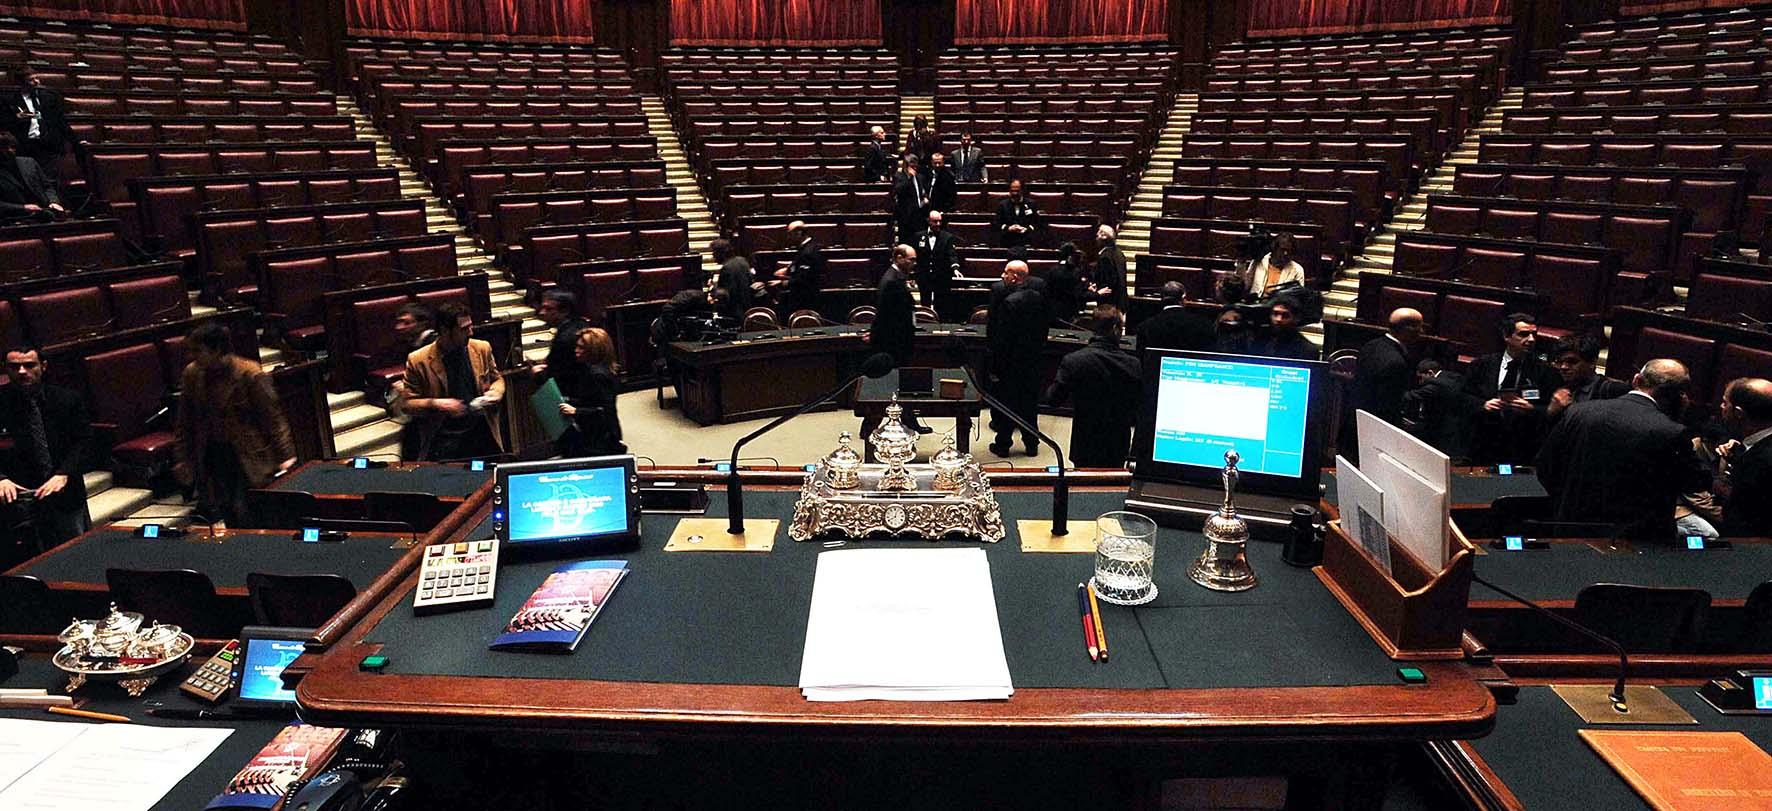 Parlamento aula vuota